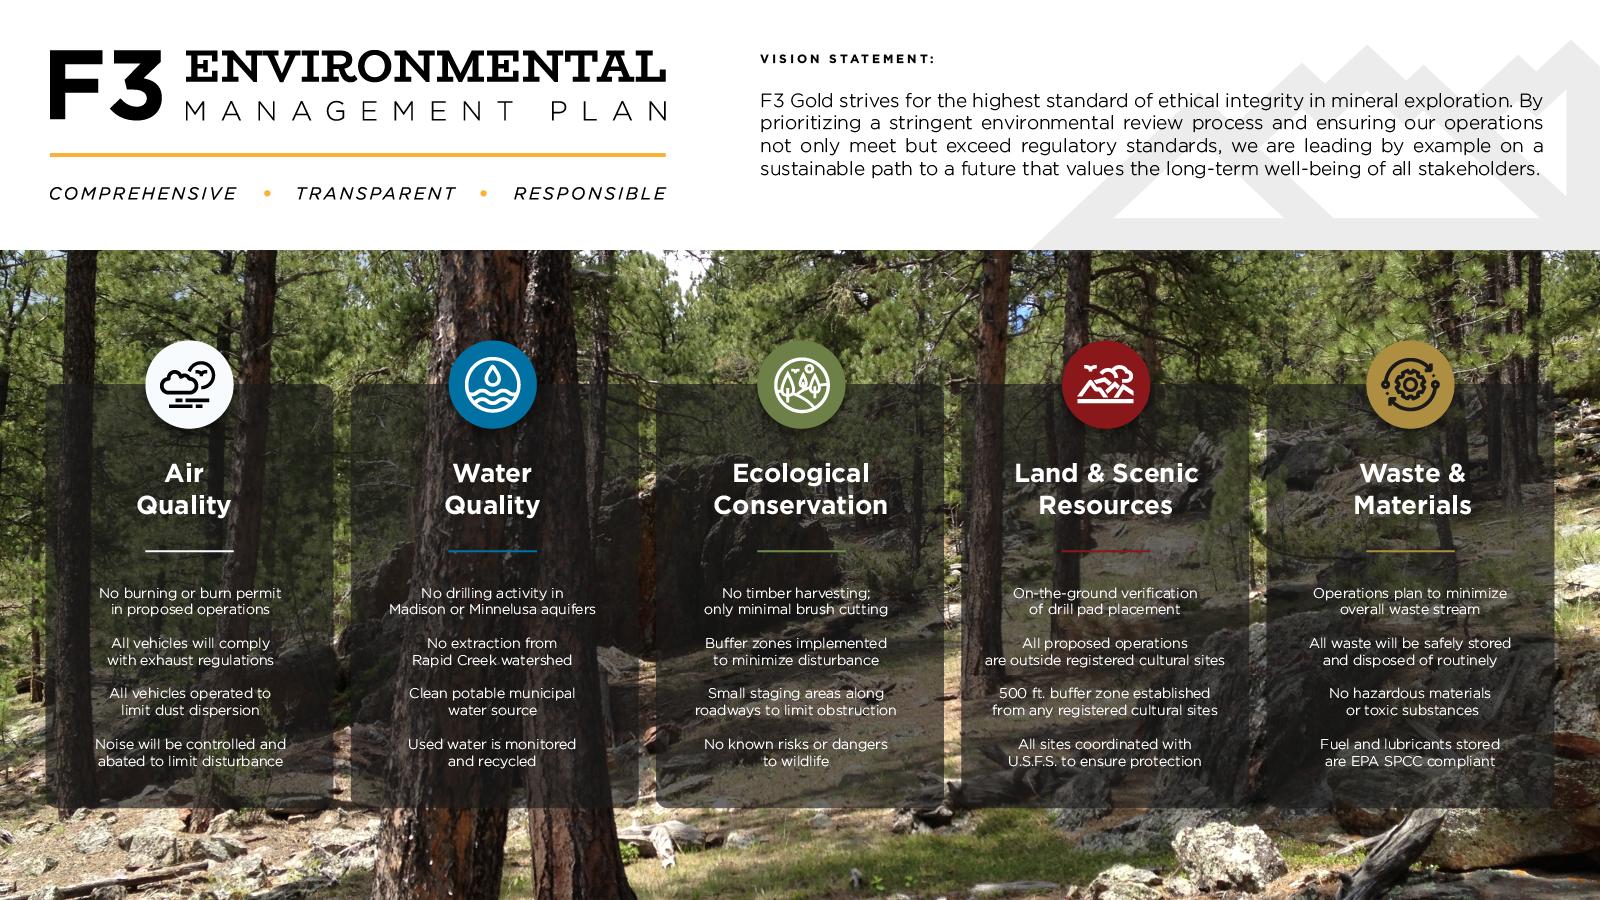 F3 Environmental Management Plan